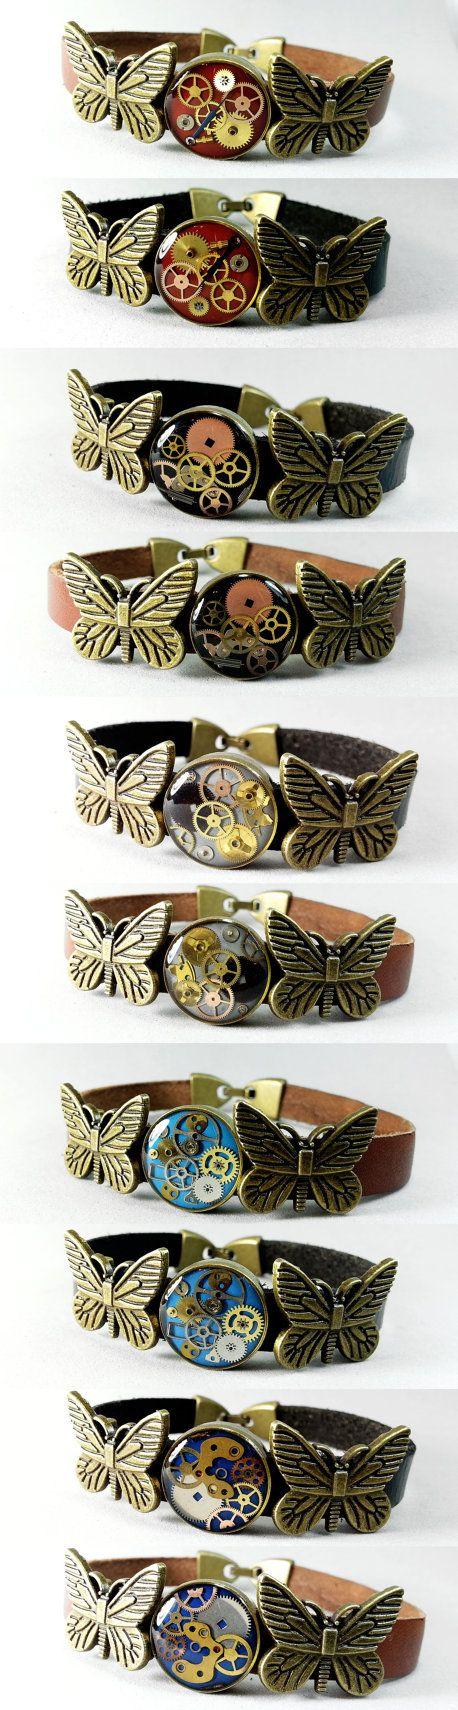 Steampunk - Steampunk Butterfly leather bracelet my initial name bracelet gift resin bracelet cuff custom bracelet best gift for her animal lover by ByEmilyRay